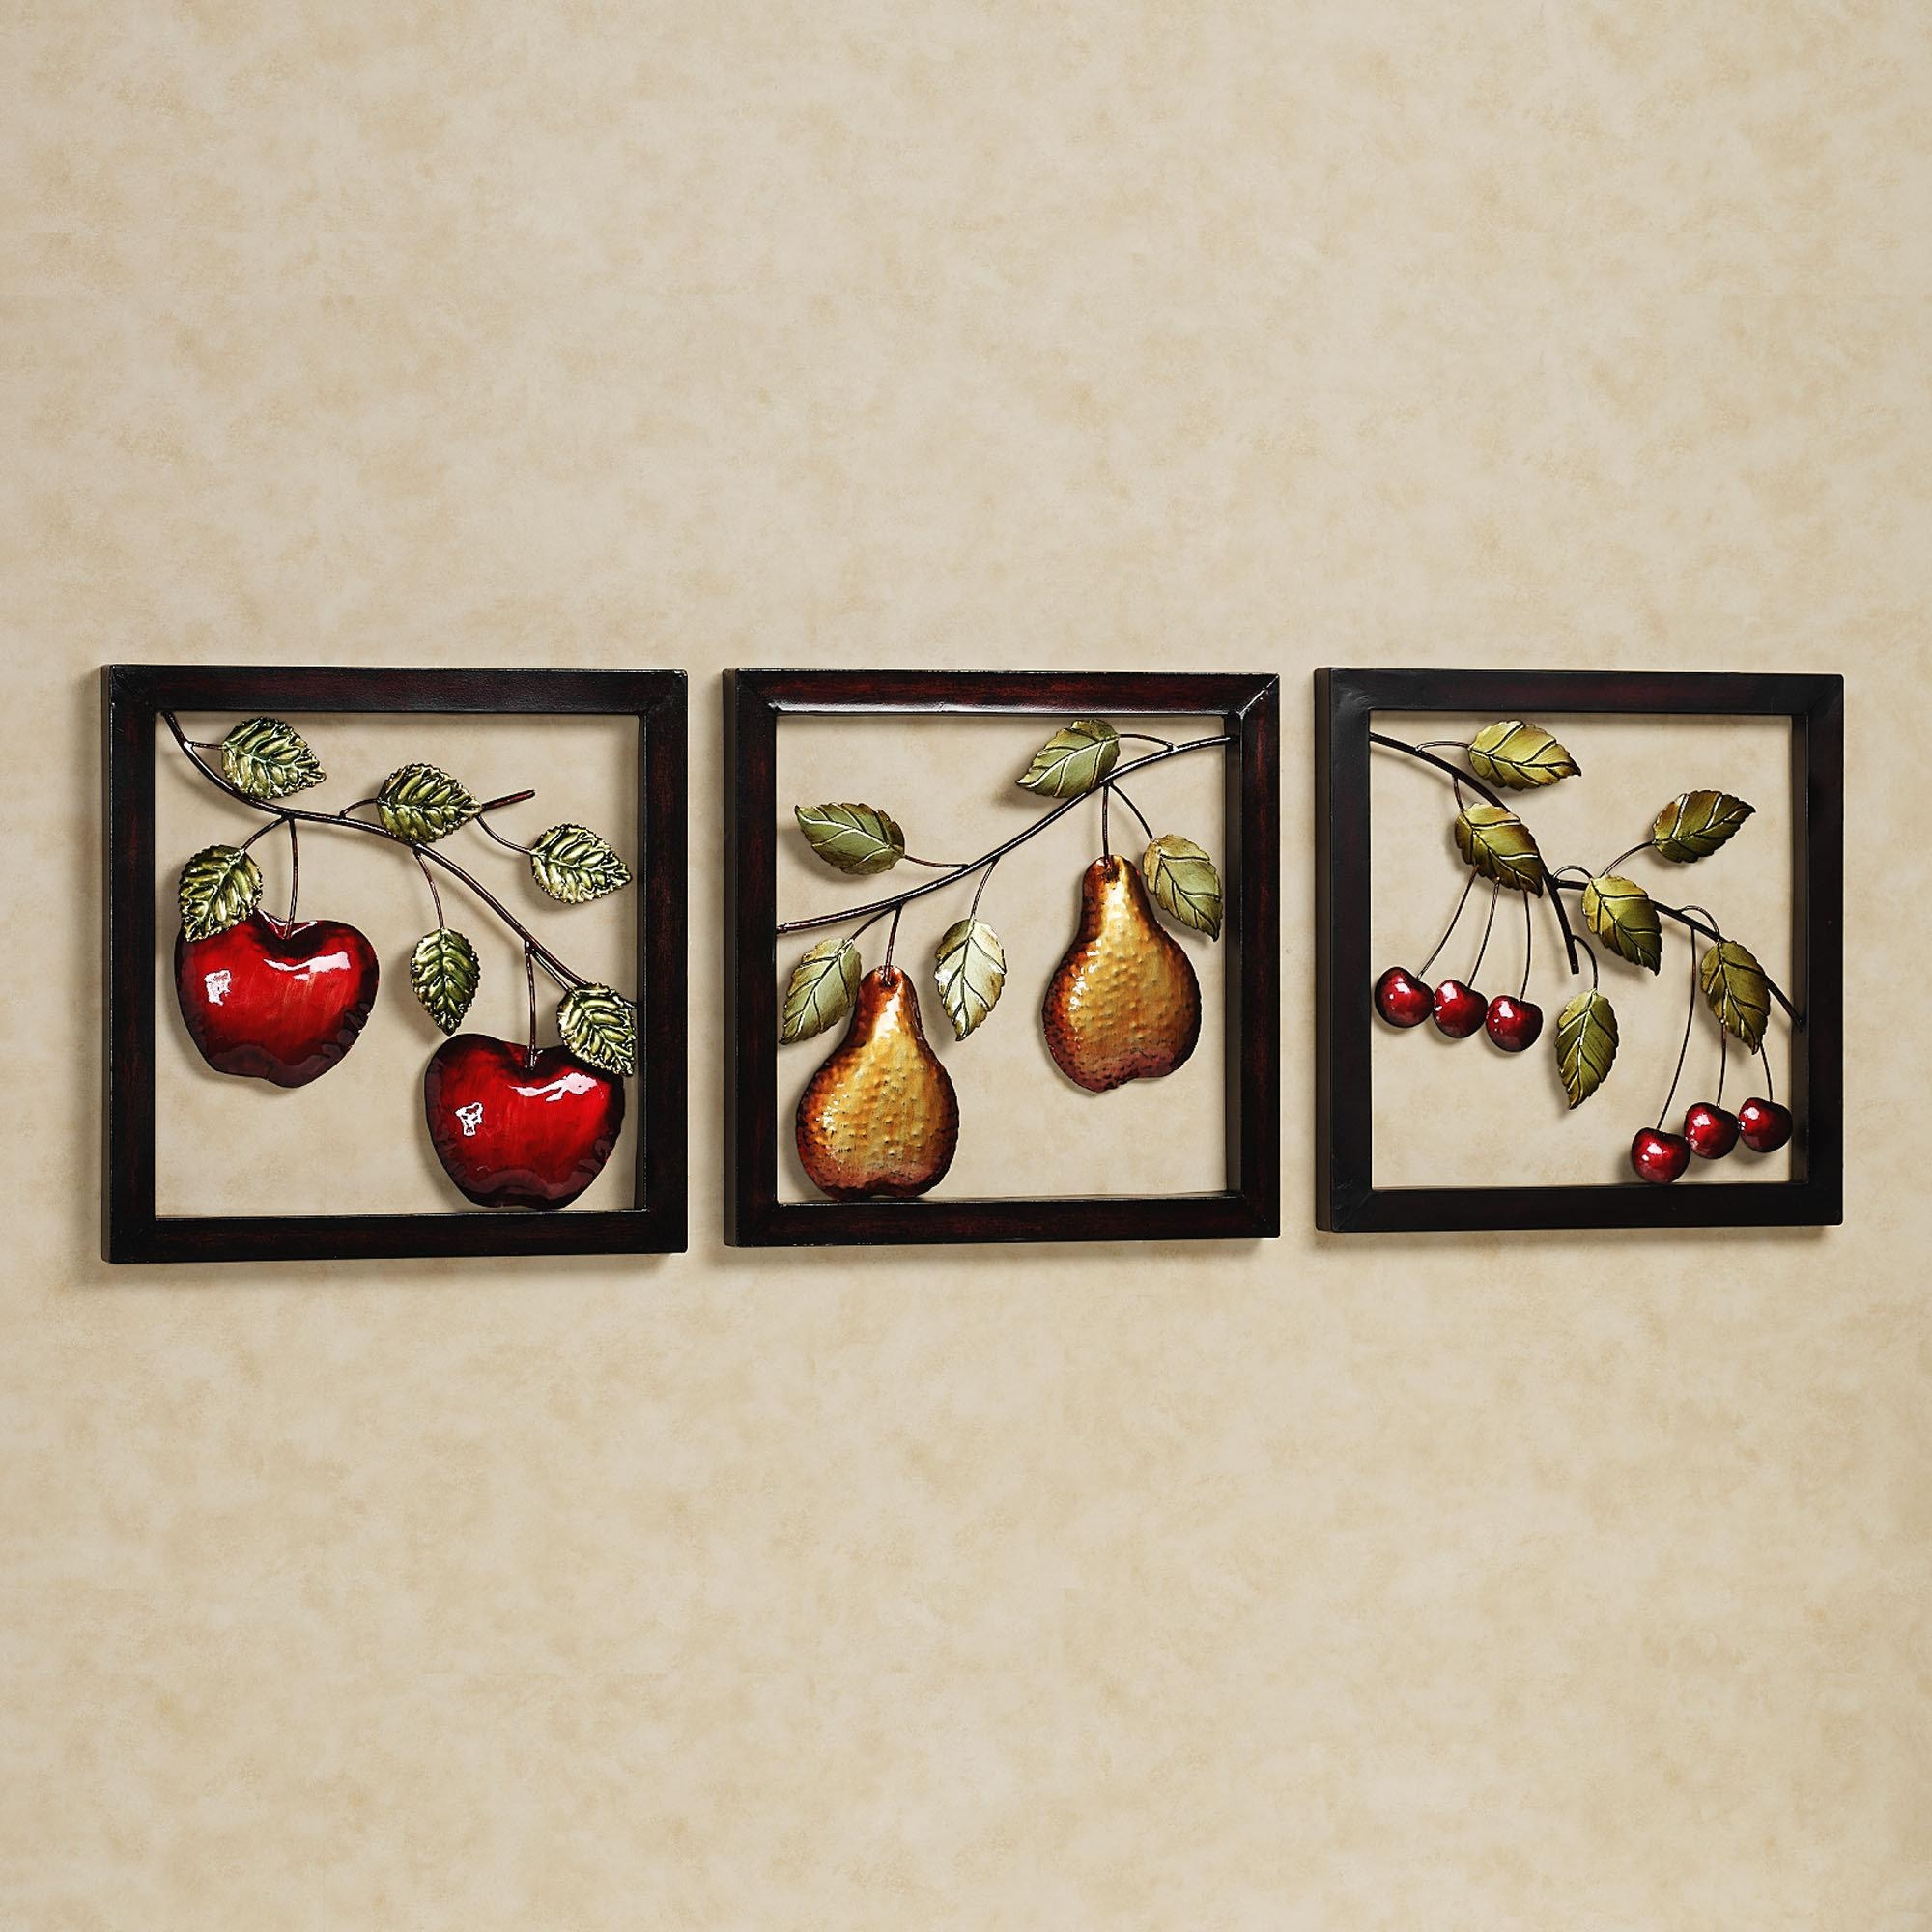 Kitchen Metal Wall Art Decor | Gen4Congress Within Kitchen Wall Art (Image 9 of 20)